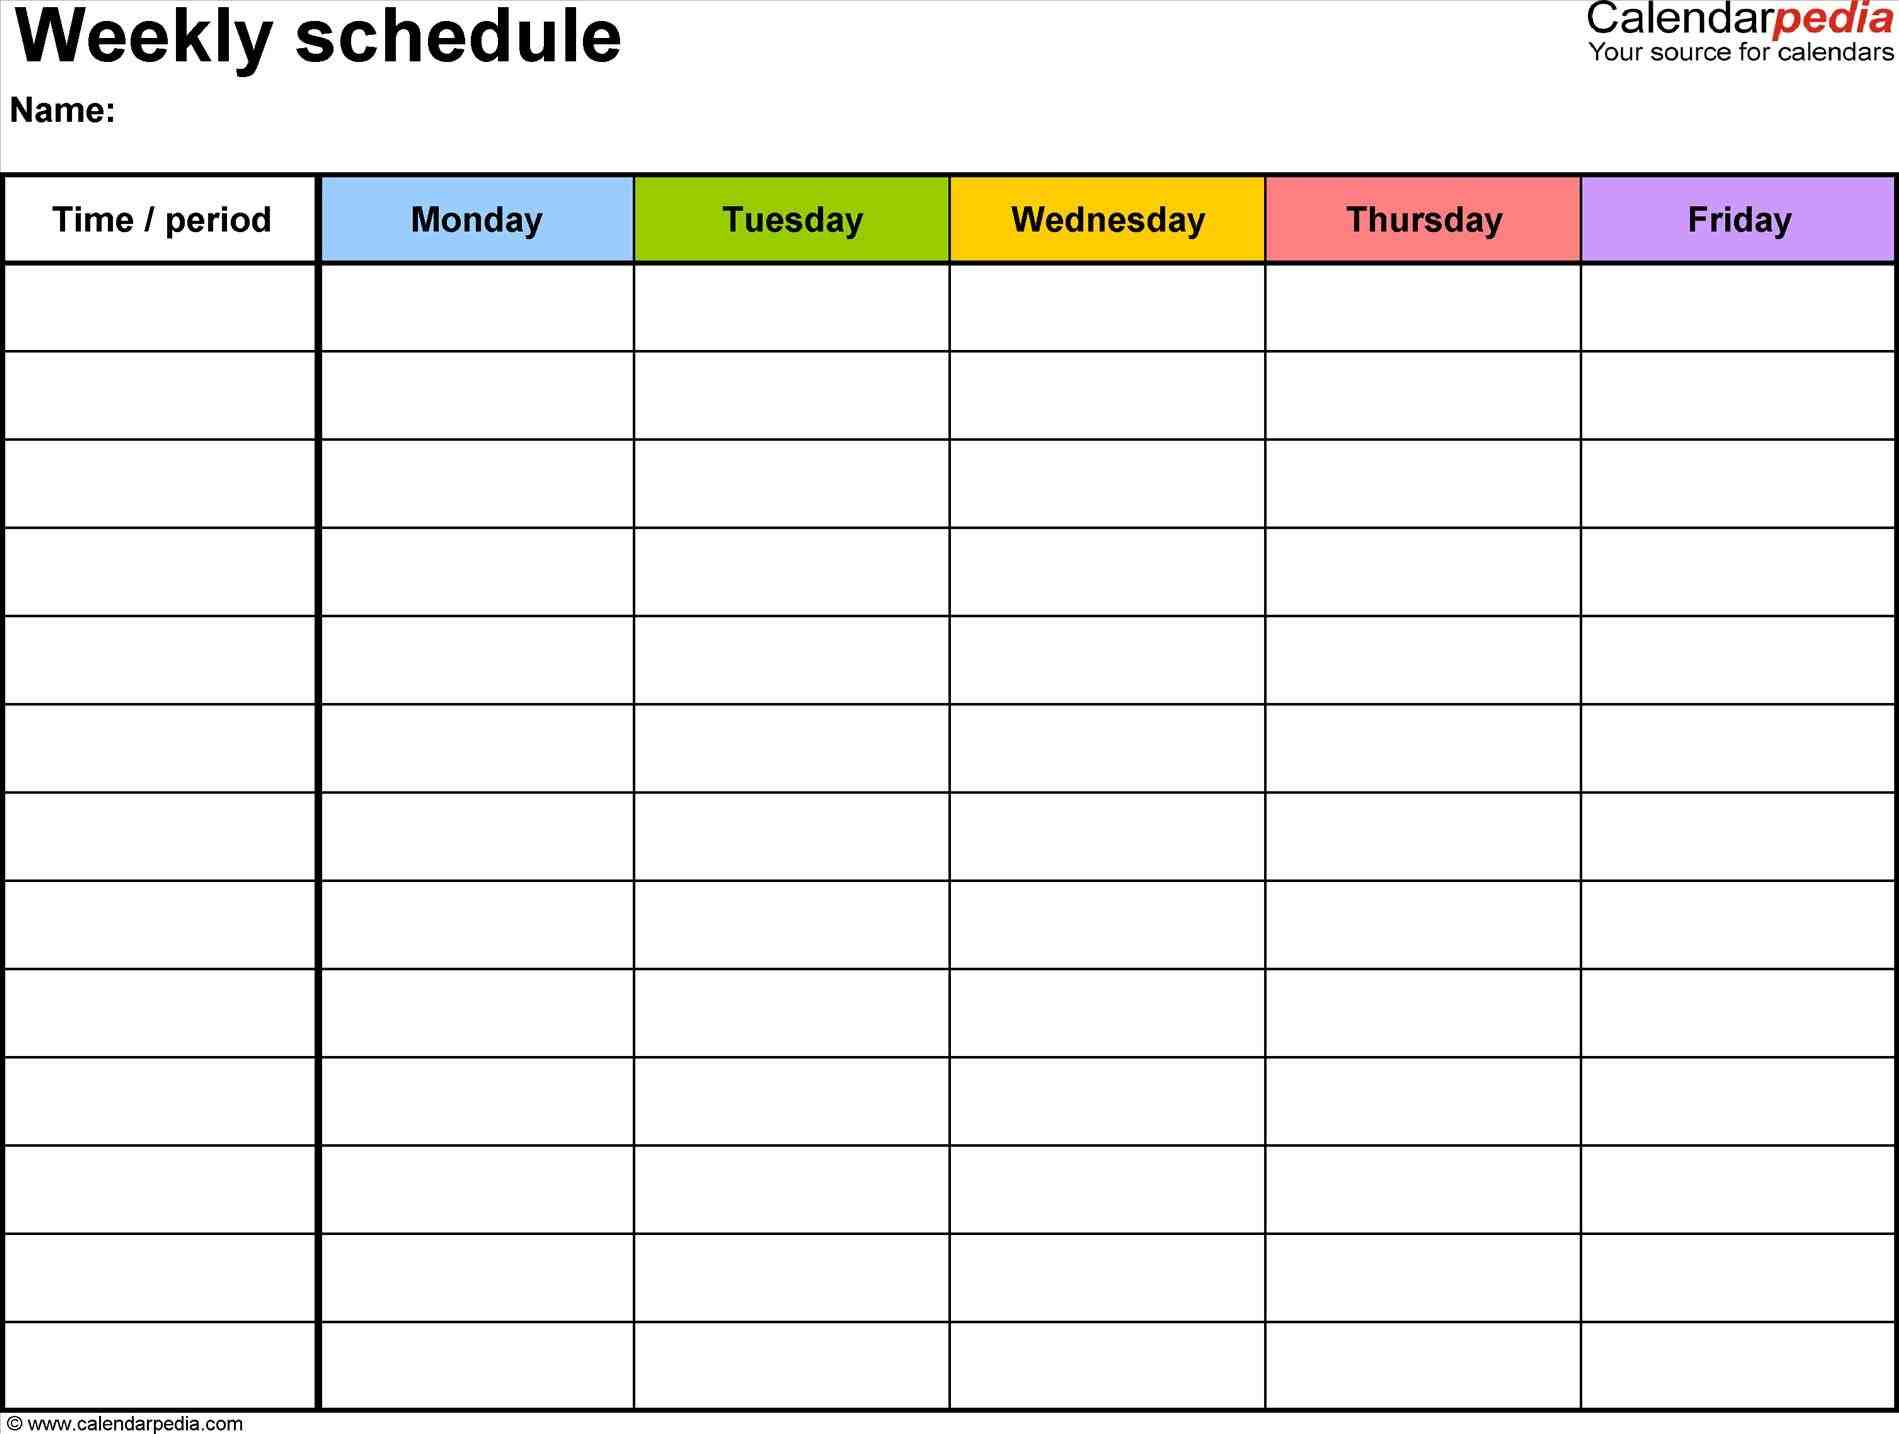 templates for excel work calendar commonpenceco work Employee Work Calendars schedule calendar commonpenceco employee template free employee Employee Work Calendars